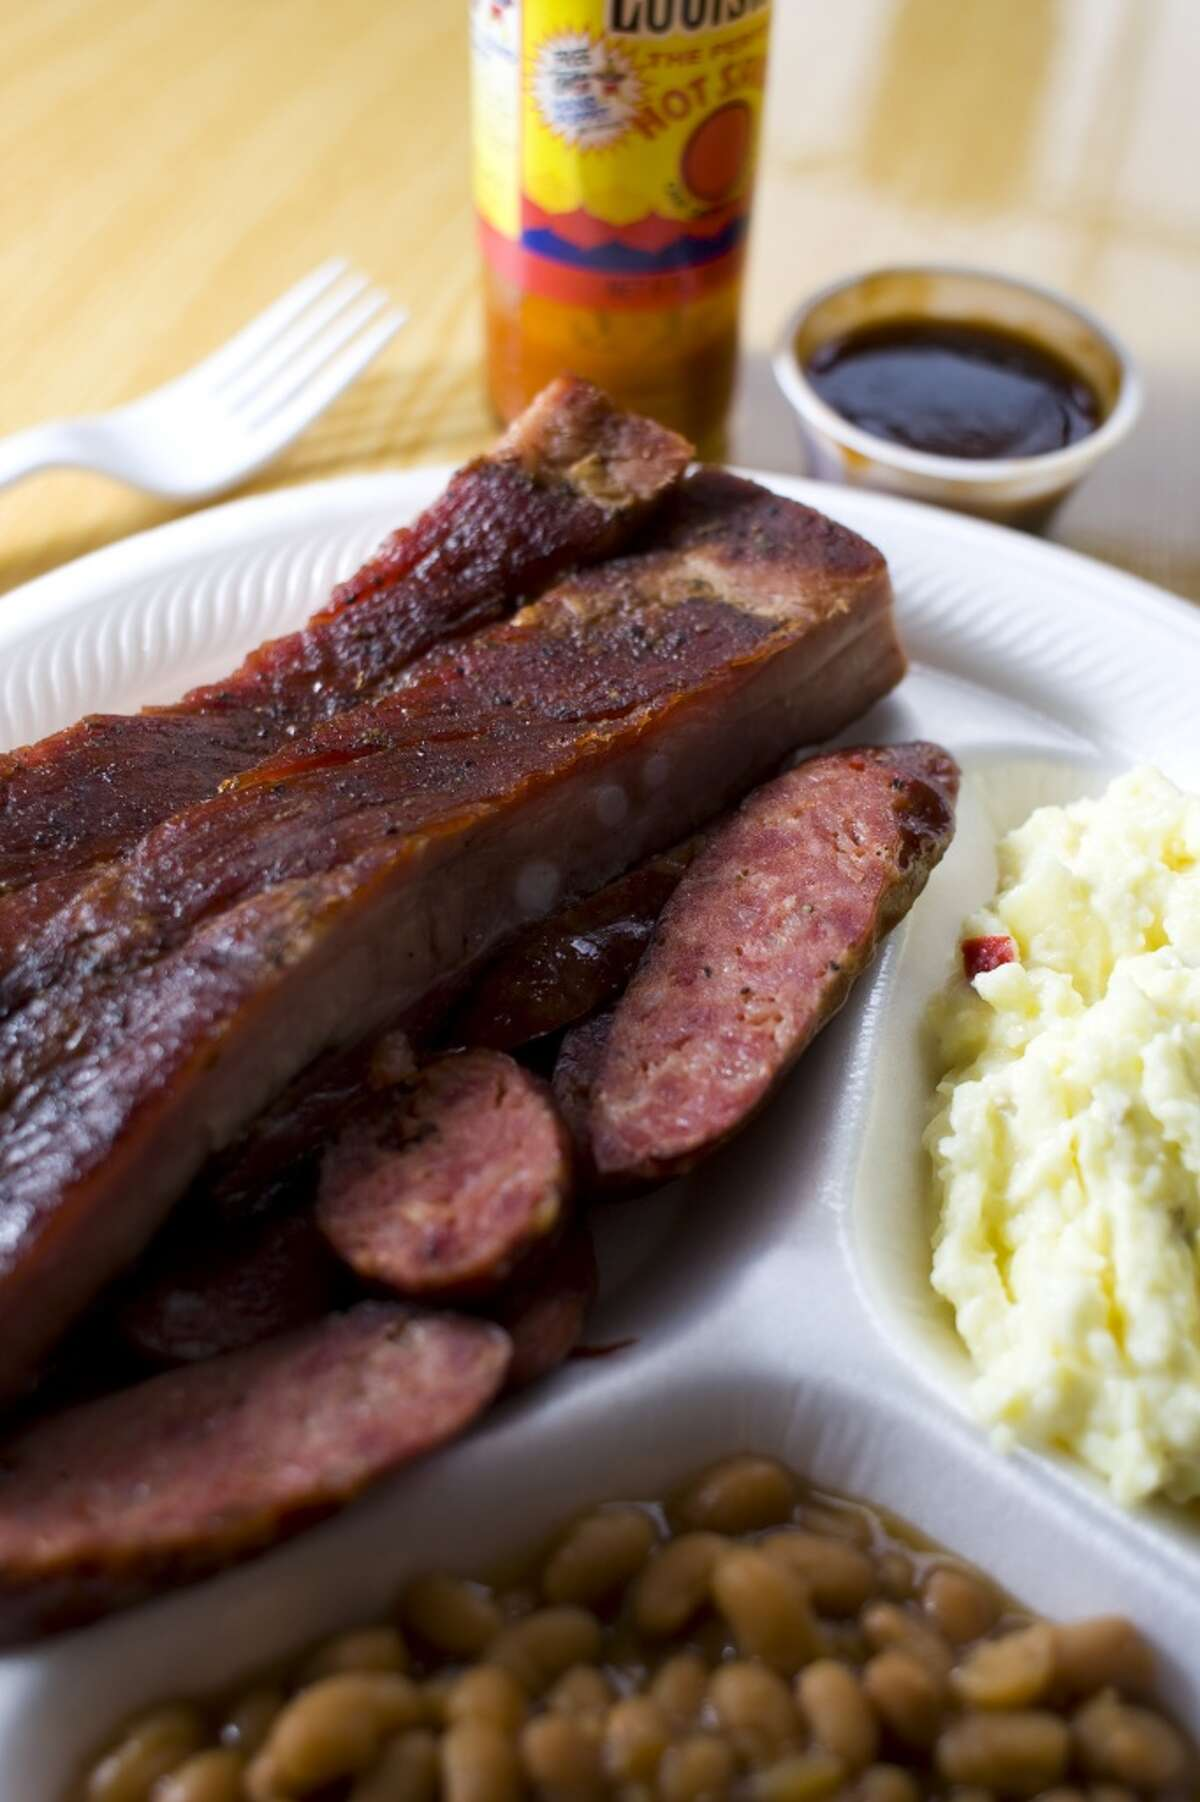 Virgie's Bar-B-Que's pork ribs and sausage.